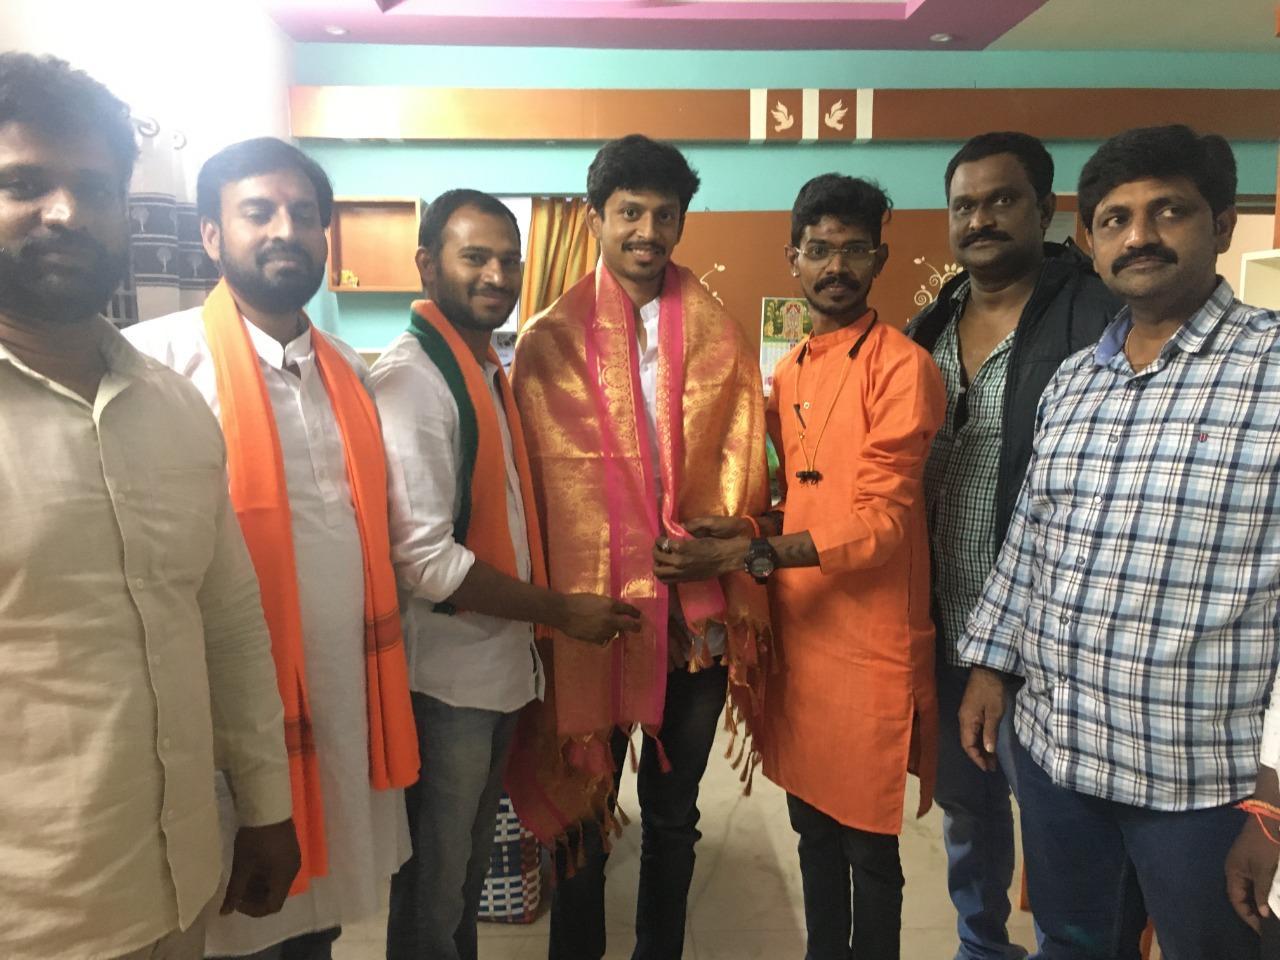 HariBabu Naidu Ramisetty | District General Secretary | Youth Wing Town Incharge | HR Manager of Sundhar Raja Nursing Home | District Convener | Ongole | Prakasam | Andhra Pradesh | JanaSena | BJYM | BJP | theLeadersPage